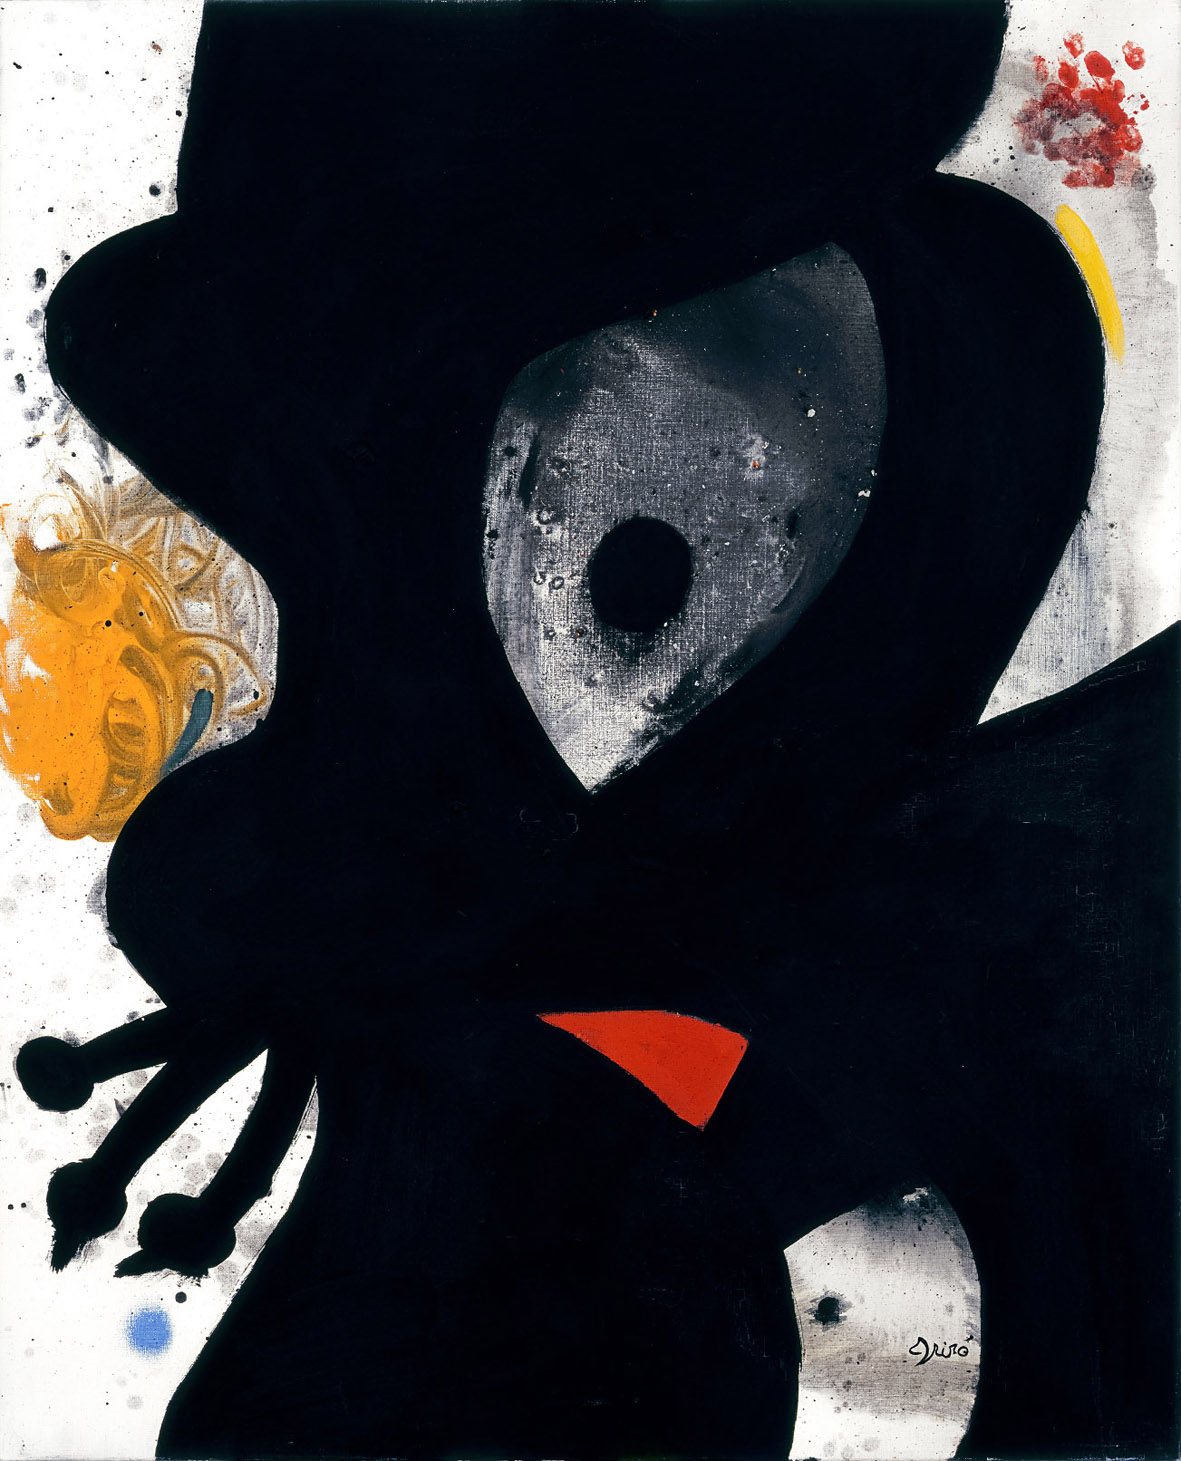 Joan Miró, Tête, 1976, olio su tela. Foto Joan Ramon Bonet. Archivo Successió Miró. © Successió Miró : ADAGP, Paris, by SIAE 2021